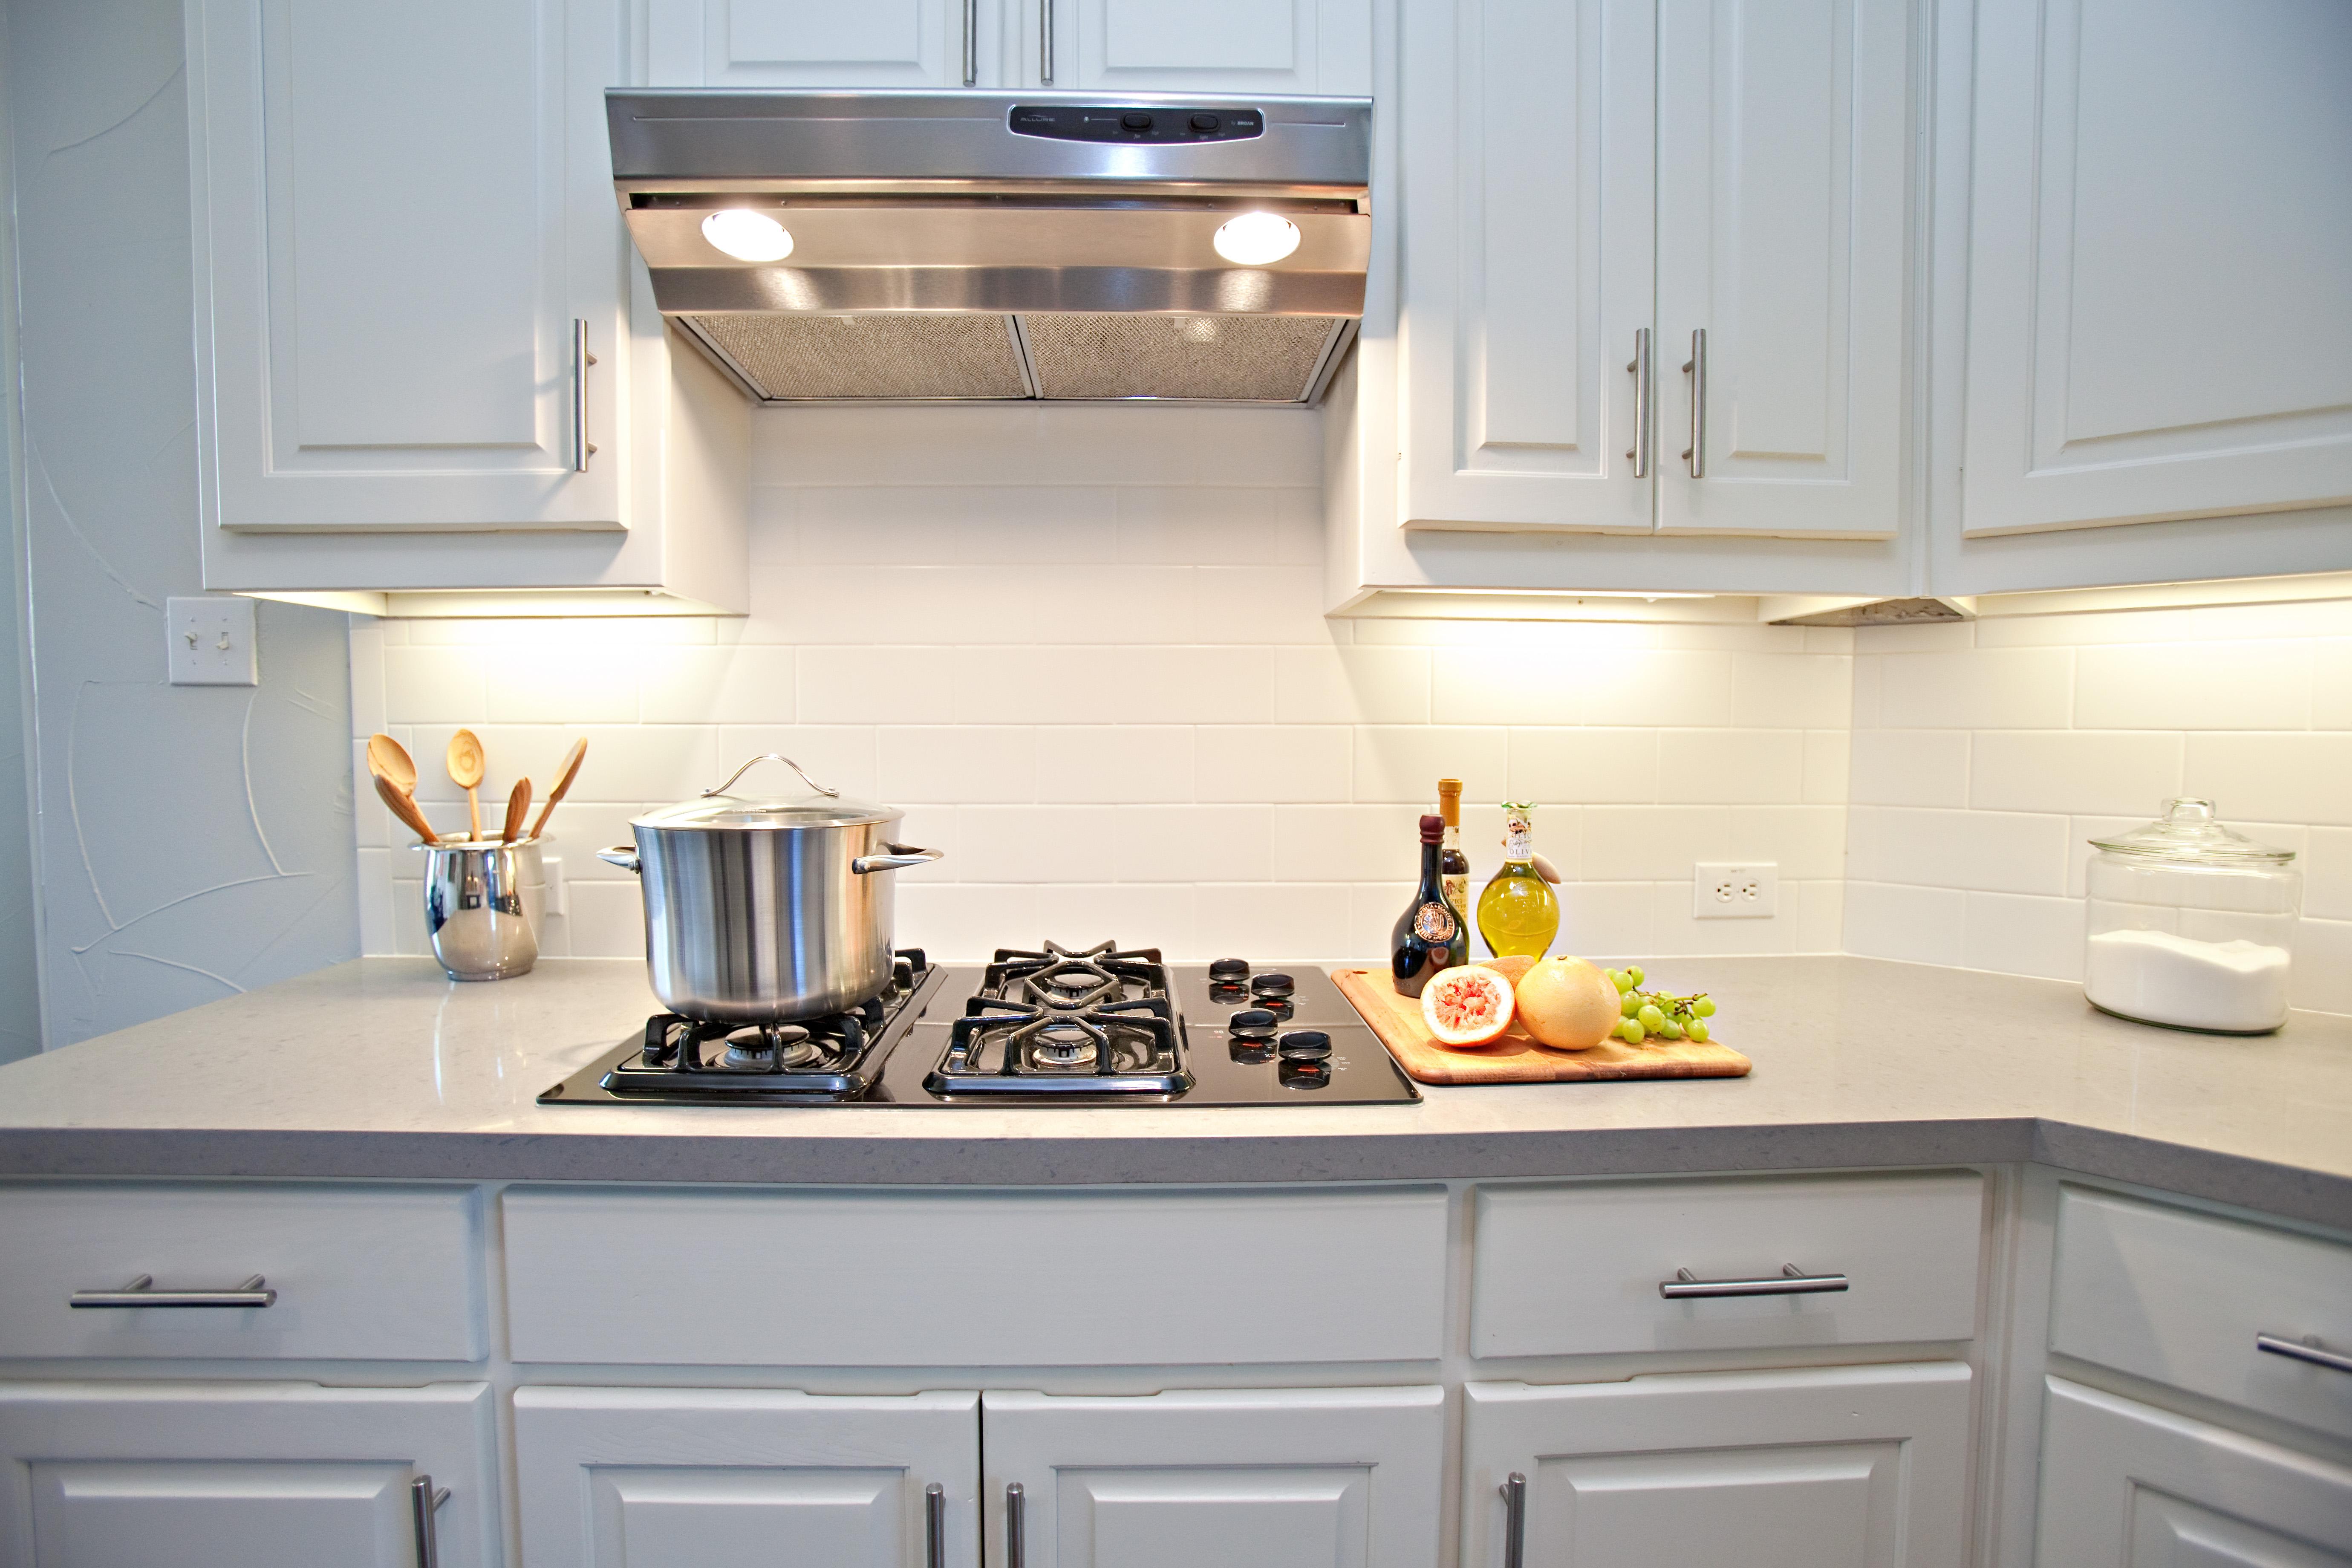 kitchen cabinets backsplash ideas photo - 8